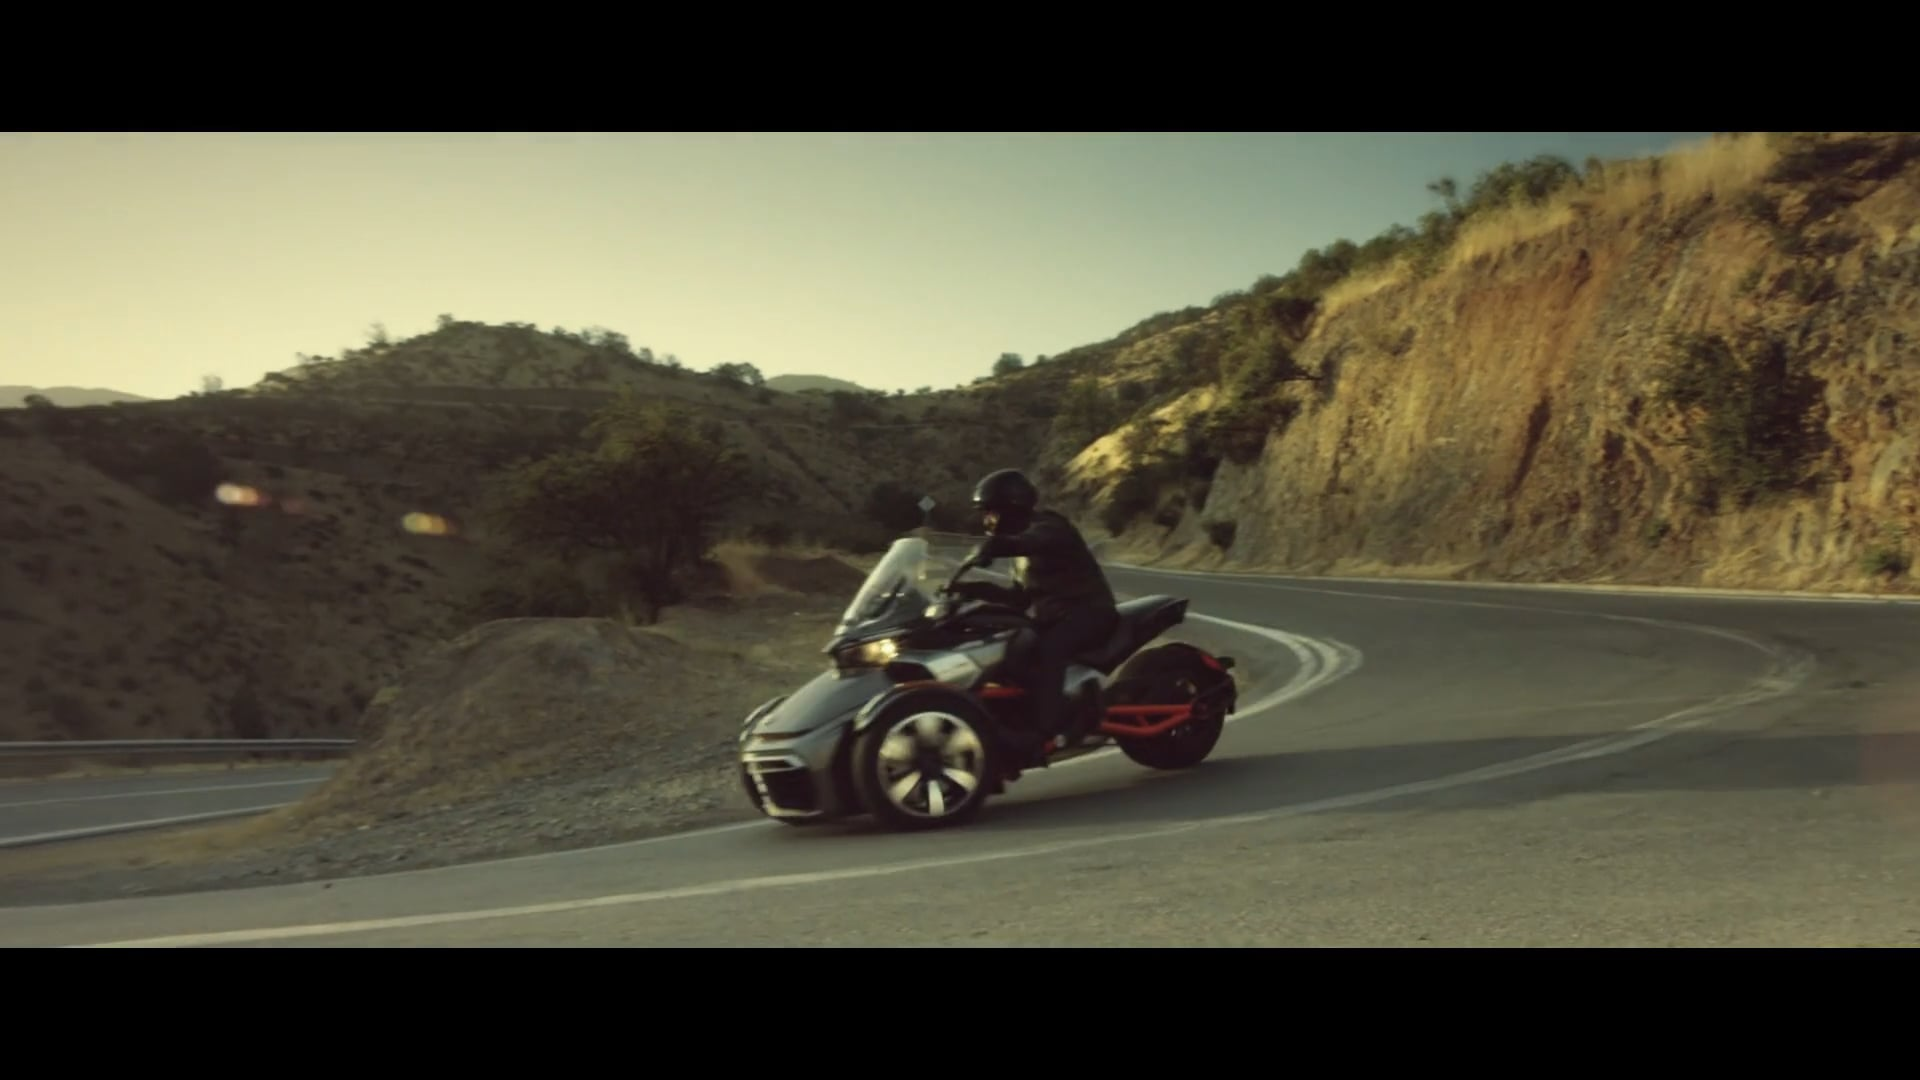 Spyder - Open Your Road